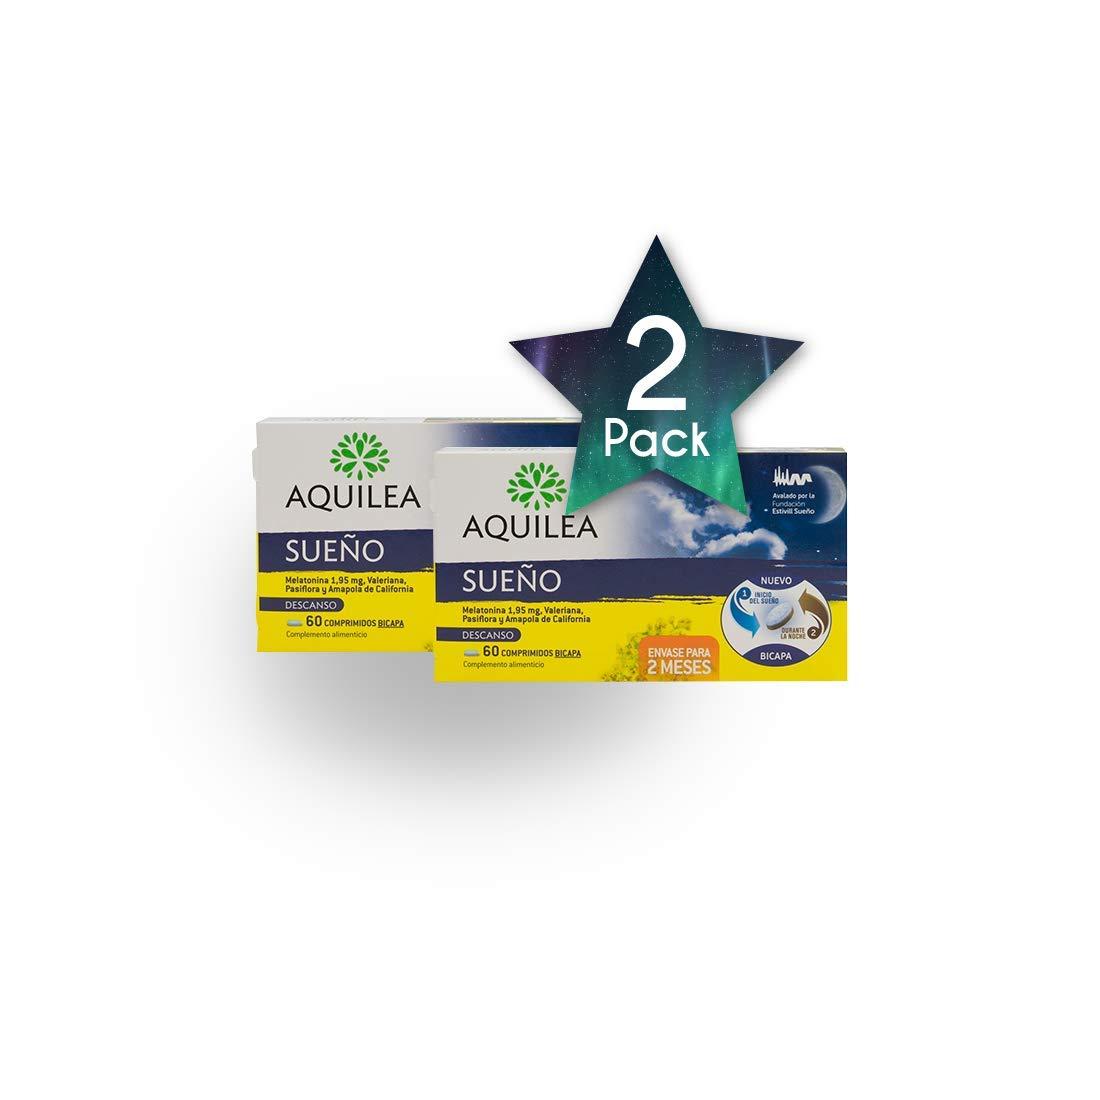 Amazon.com: 2PACKS AQUILEA Sleep 60 Tabs – Health Care ...